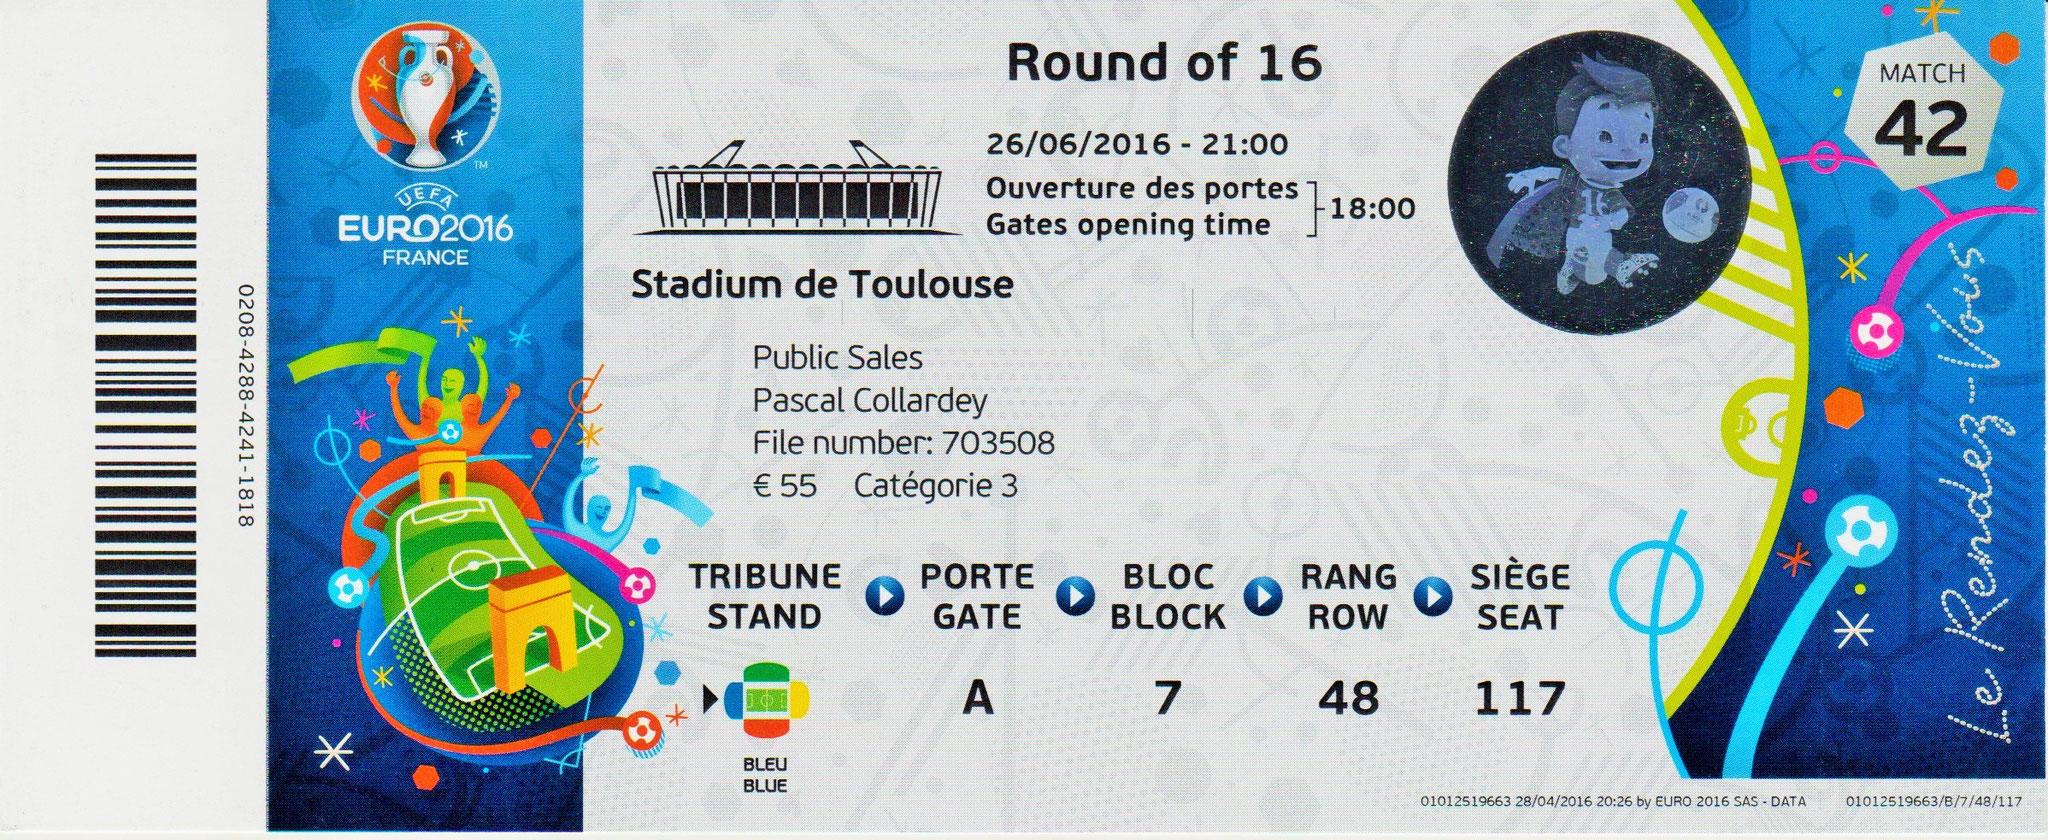 26/06/2016 Toulouse : 1/8 Fin Belgique  4 - 0  Hongrie  > Alderweireld, Batshuayi, Hazard, Carrasco <